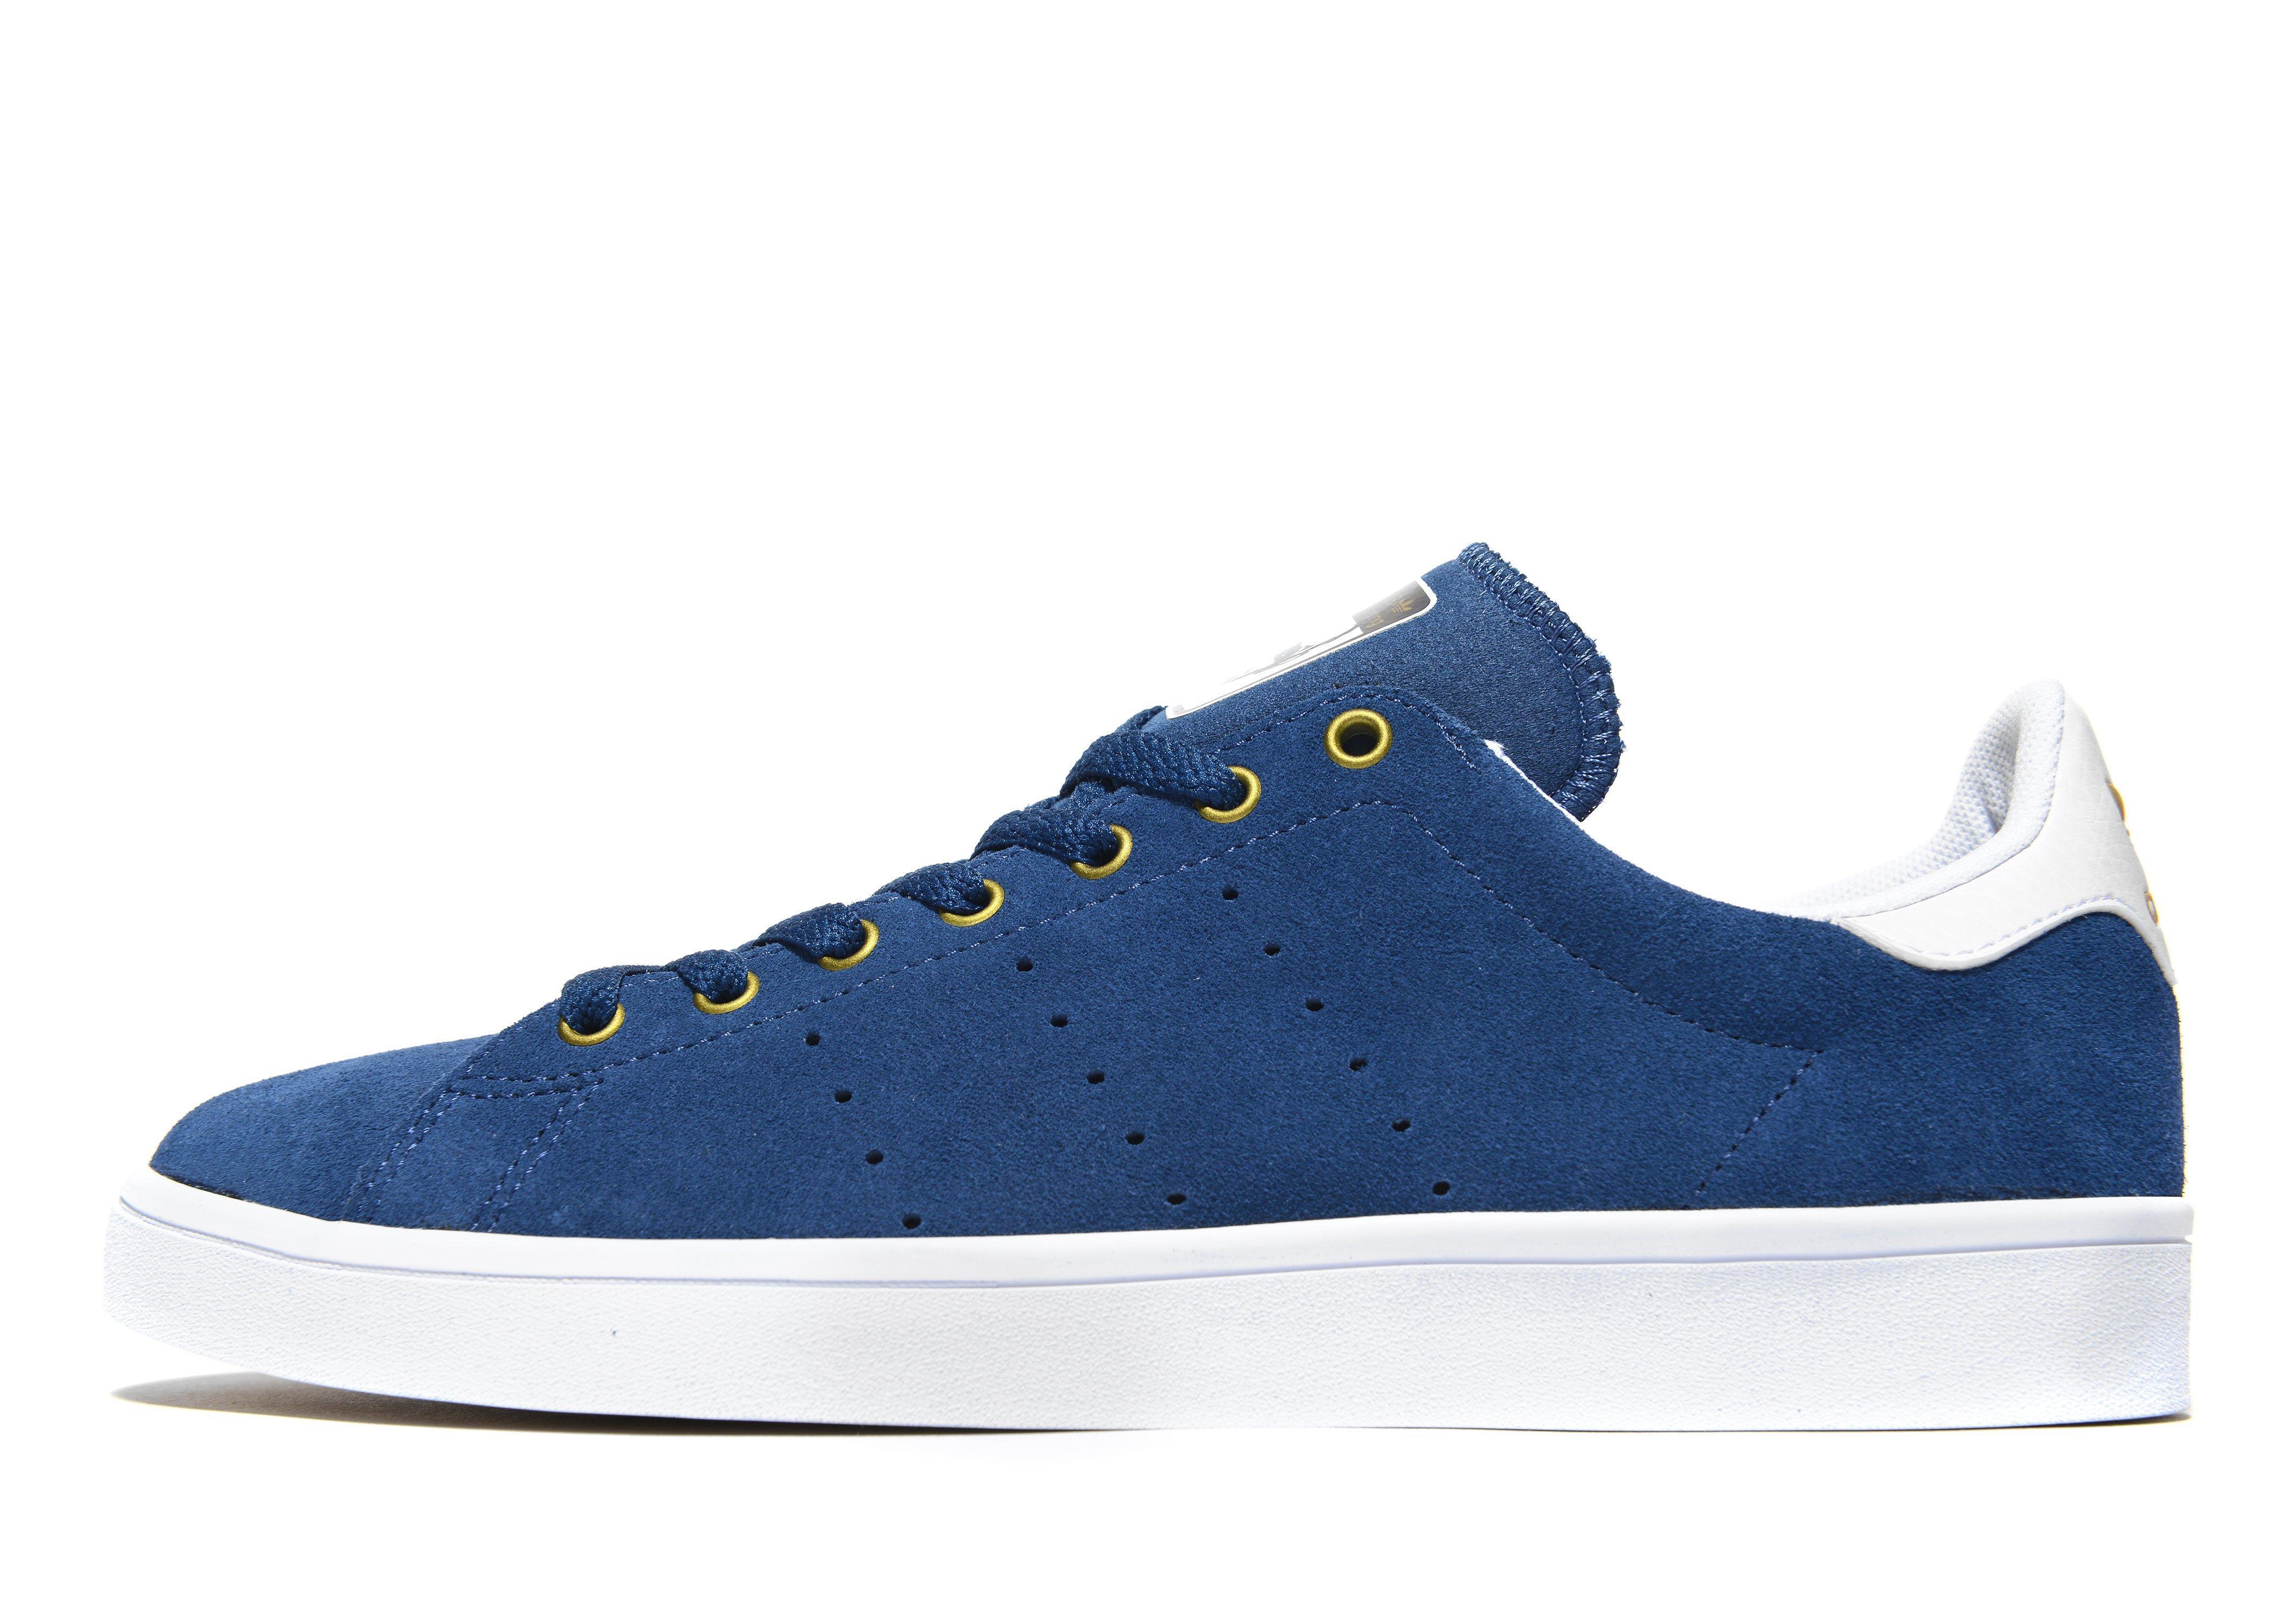 Adidas Originals Stan Smith Vulc in Blue for Men - Lyst dc7c8b3a7